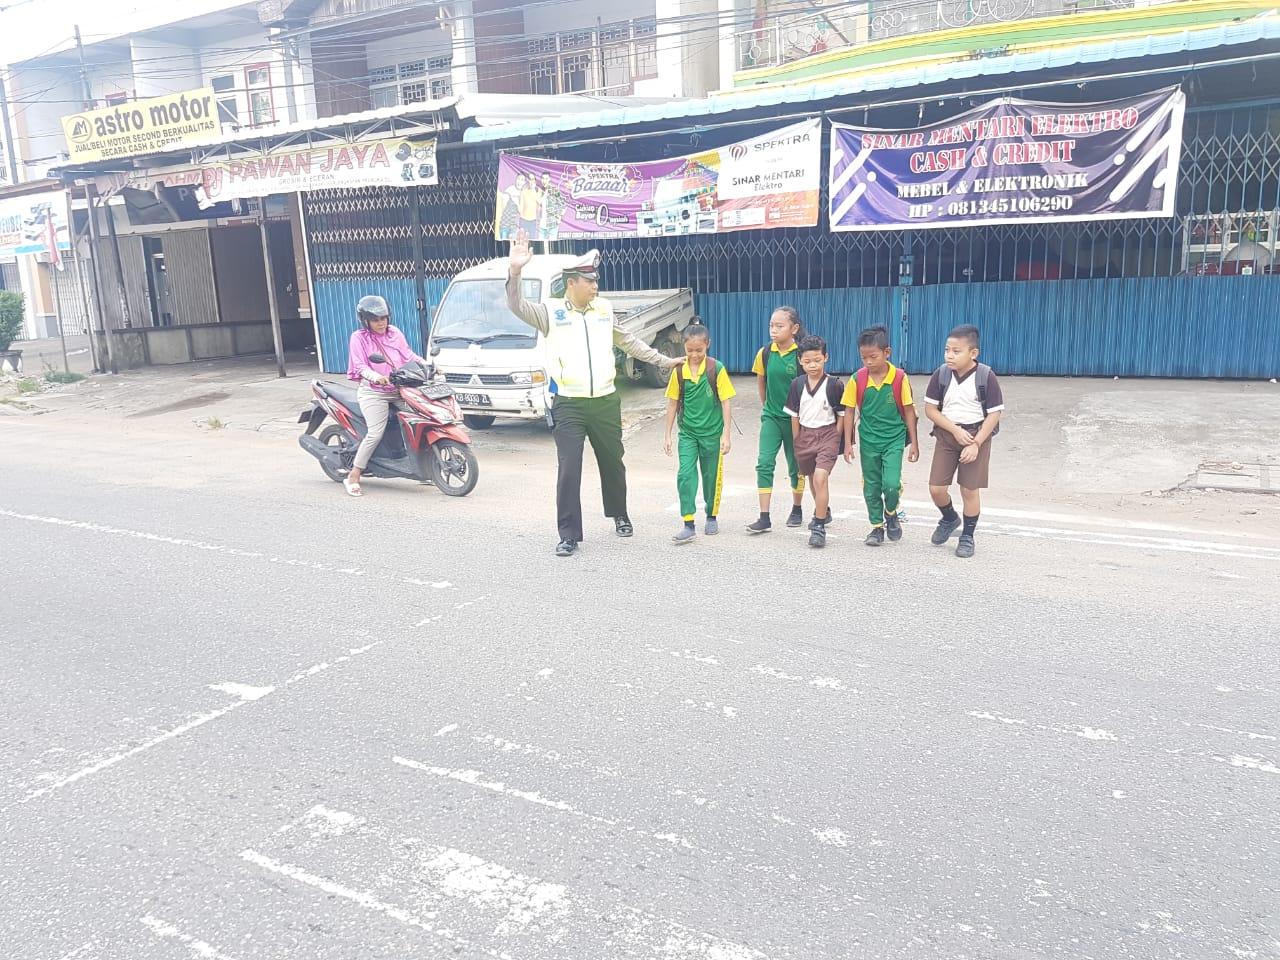 Ciptakan Kamseltibcar Di Jalan Raya, Aiptu Ruswanto Bantu Anak Sekolah Yang Akan Menyebrang Jalan